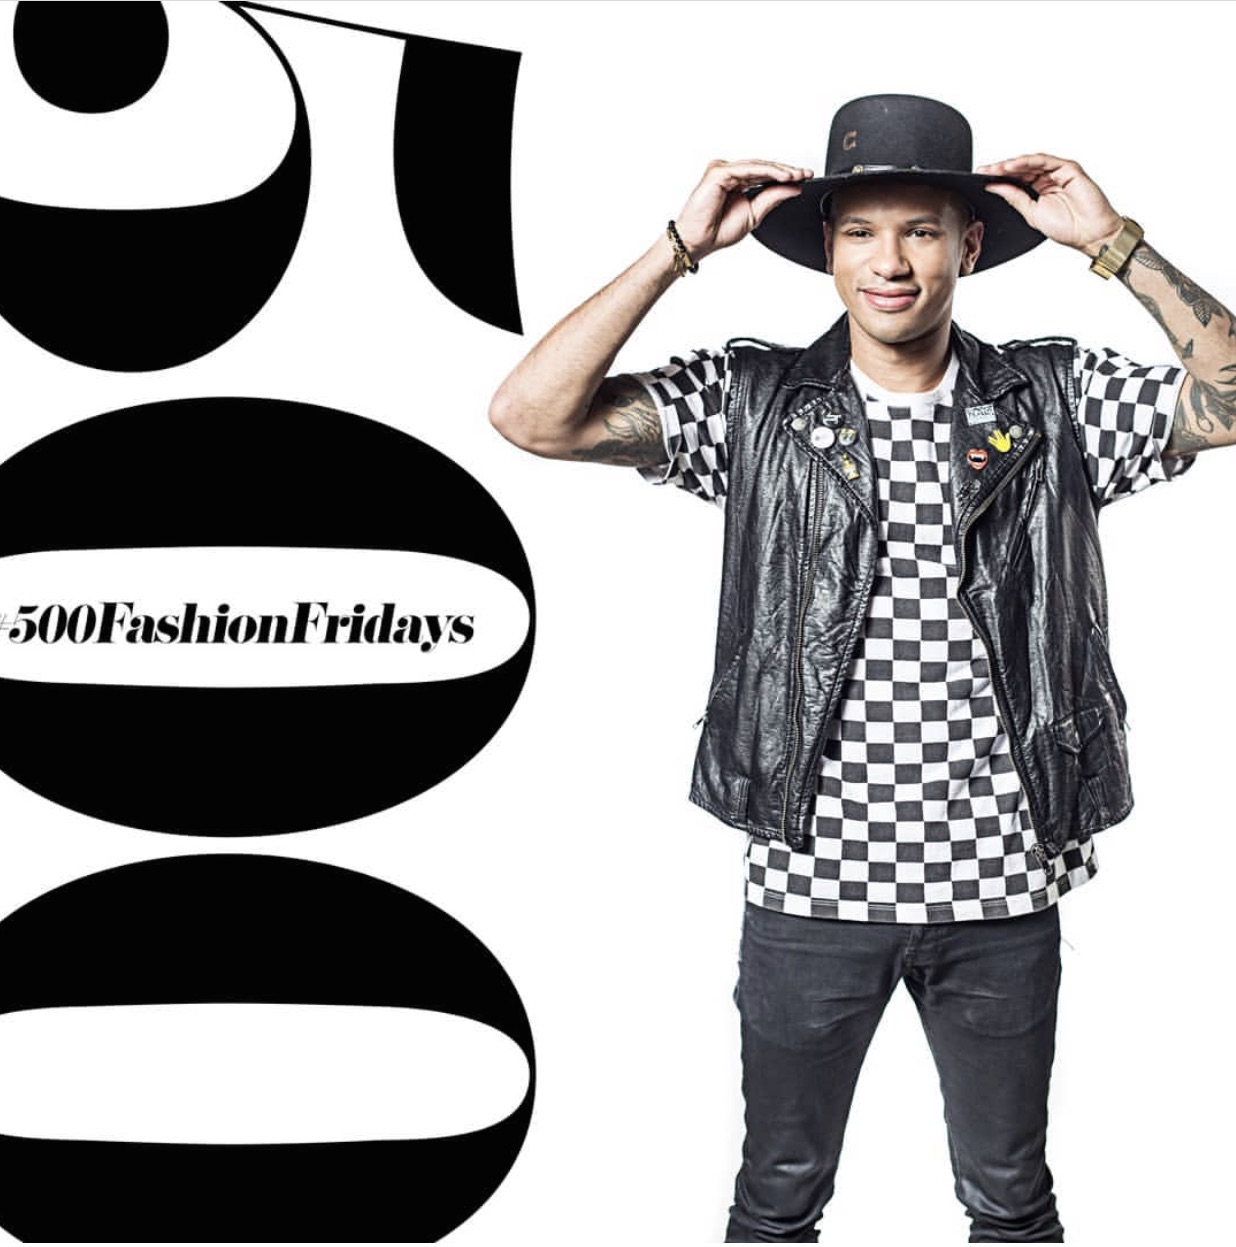 500 Fashion Fridays_Version 3.jpg